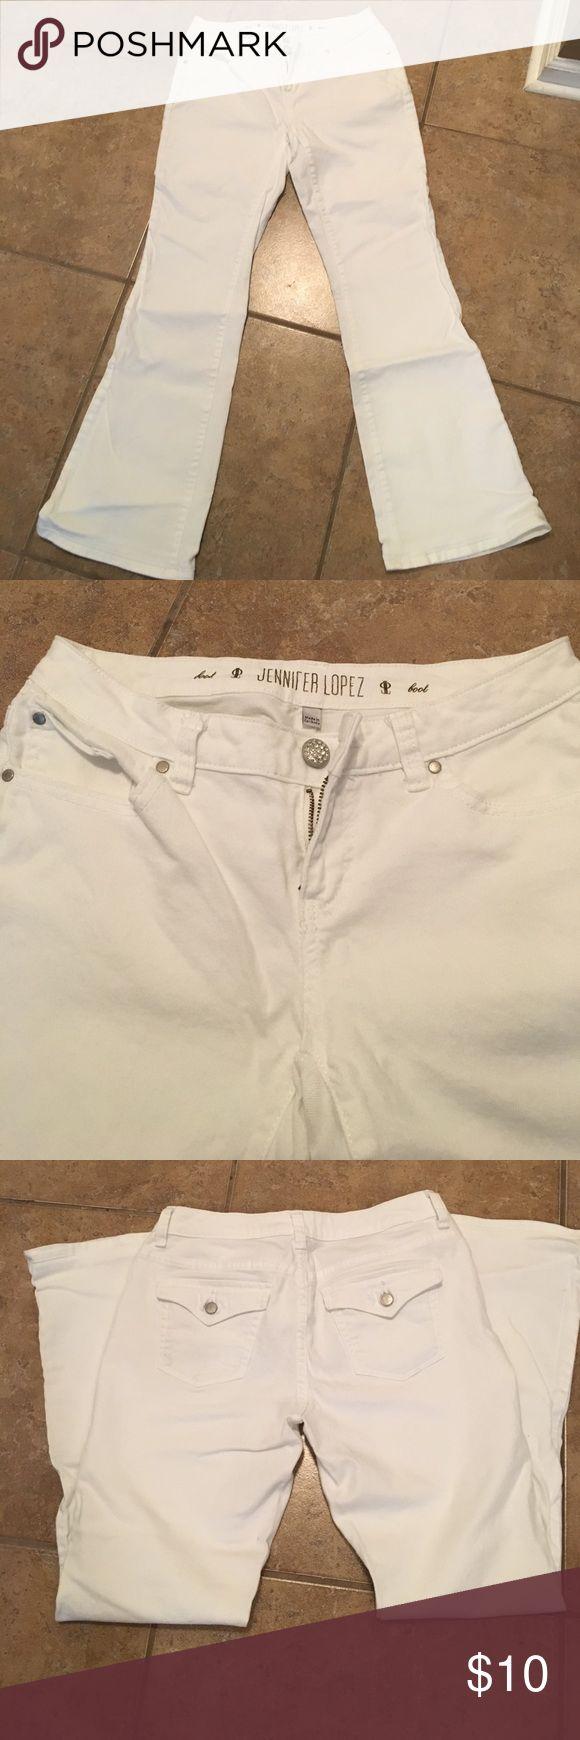 "Jennifer Lopez boot cut jeans Jennifer Lopez white boot cut jeans. Size 4. GUC. 28 1/2"" inseam. Great for spring! Jennifer Lopez Jeans Boot Cut"